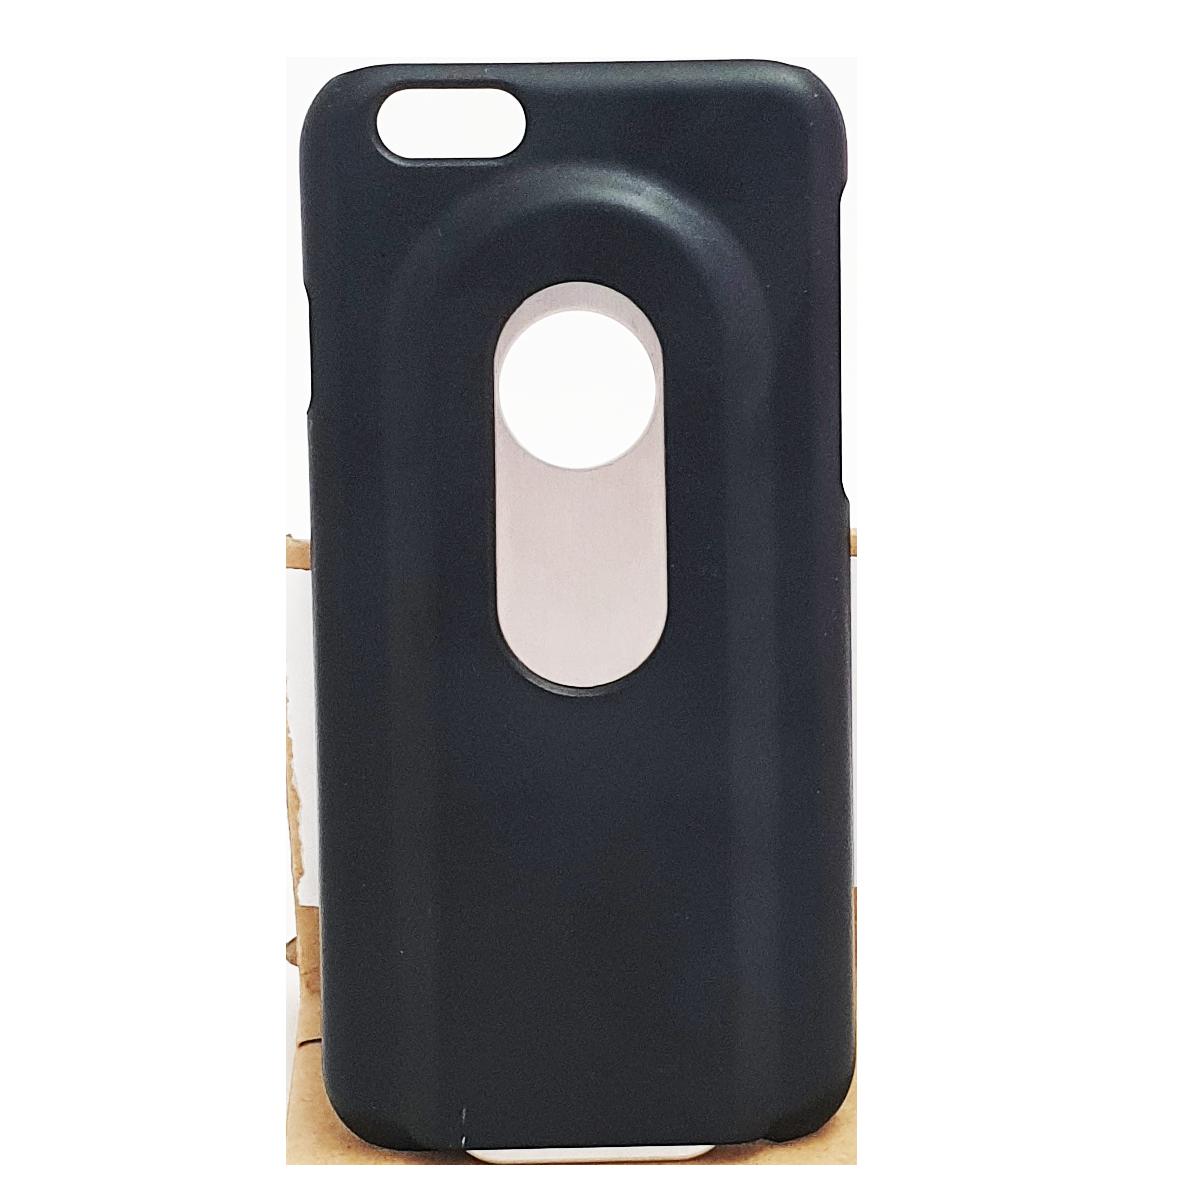 Mobilskal iPhone 6 / 6S Svart Kapsylöppnare